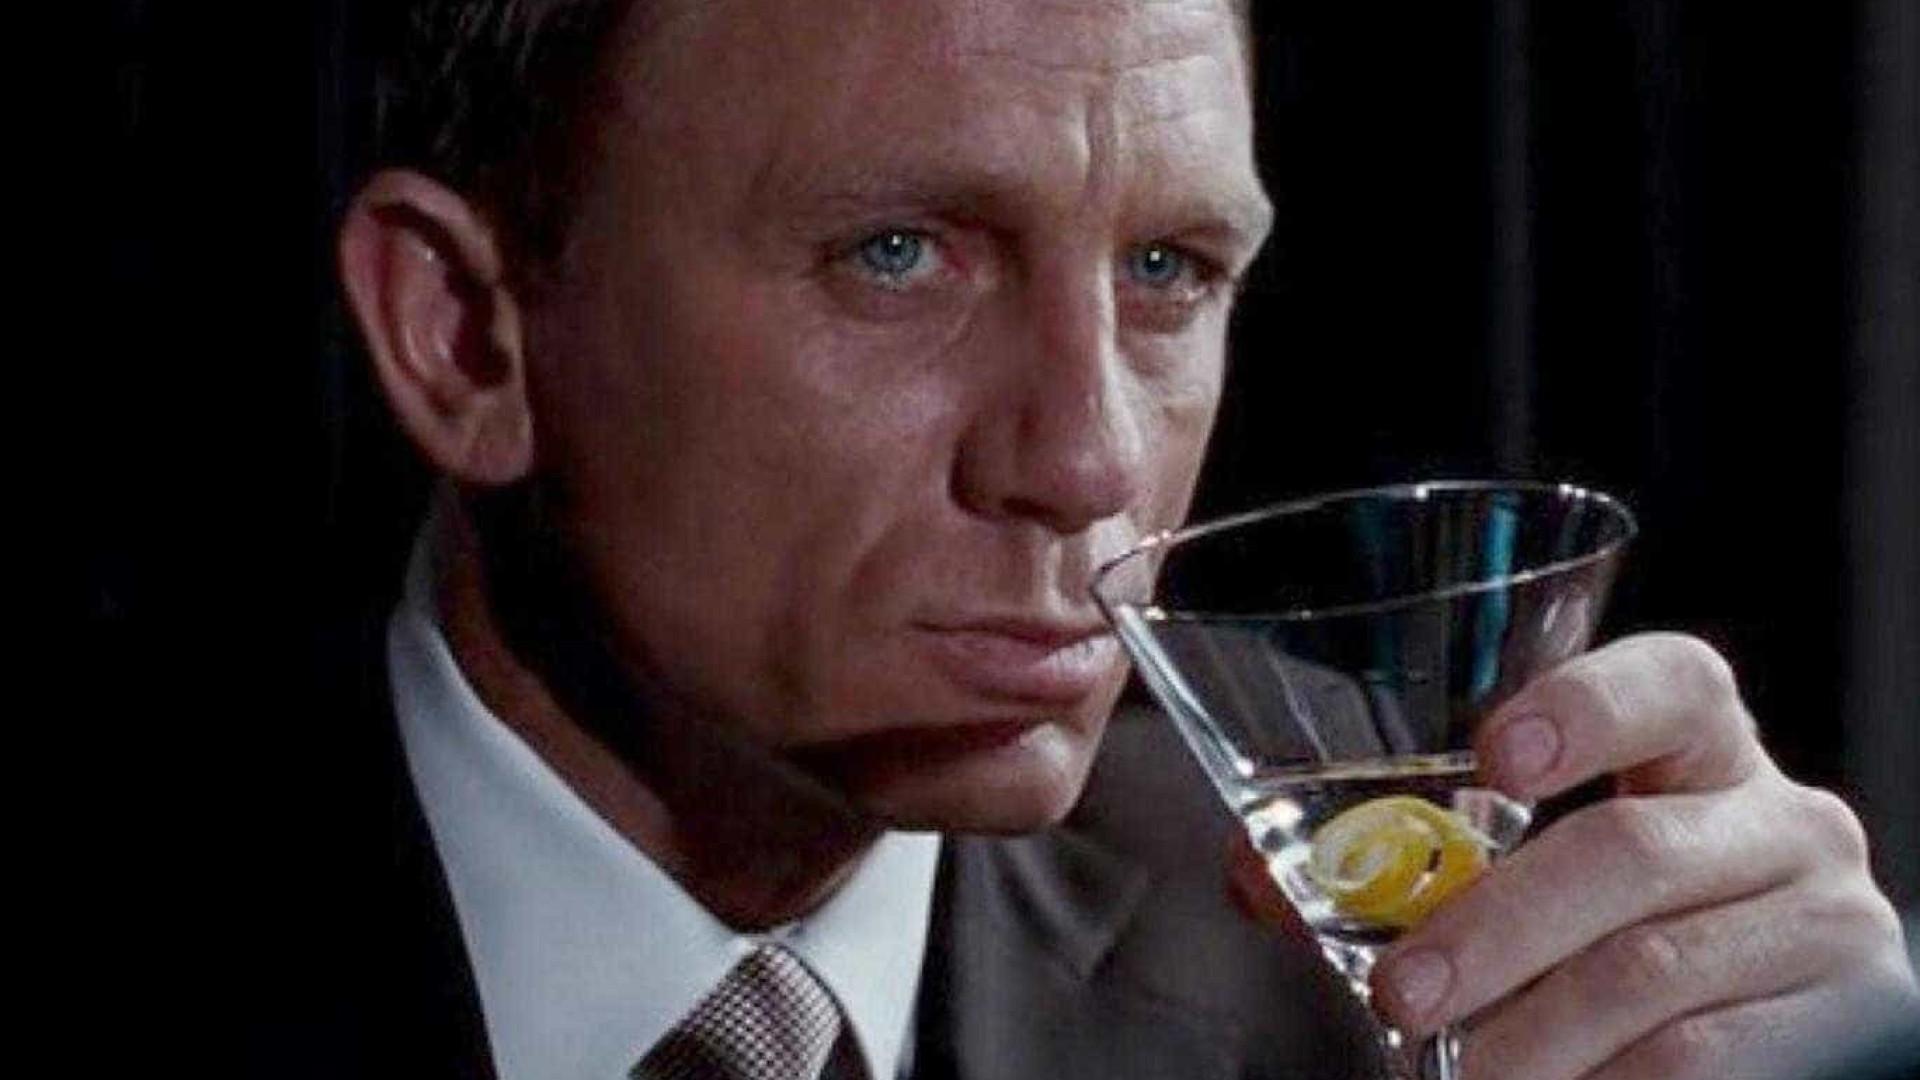 James bond drink casino royale plastic poker chip trays